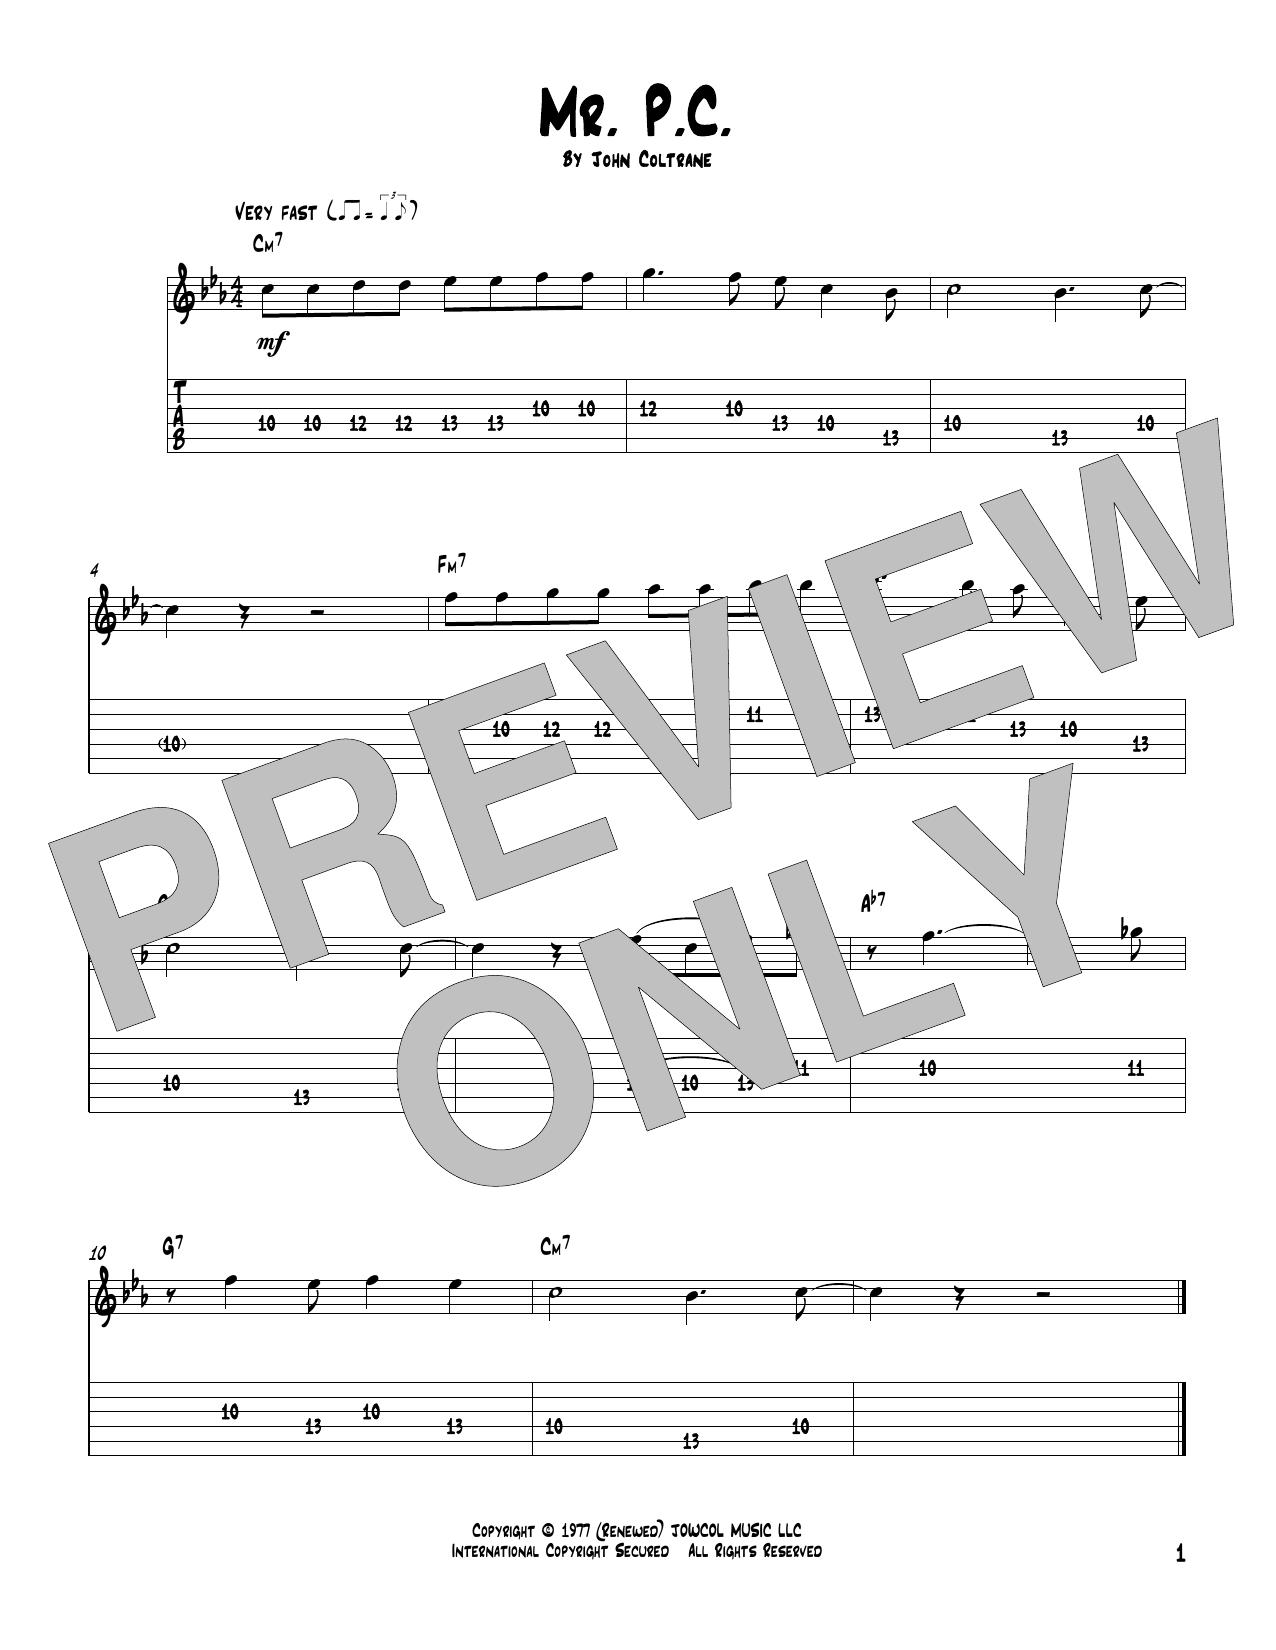 Mr. P.C. (Solo Guitar Tab)